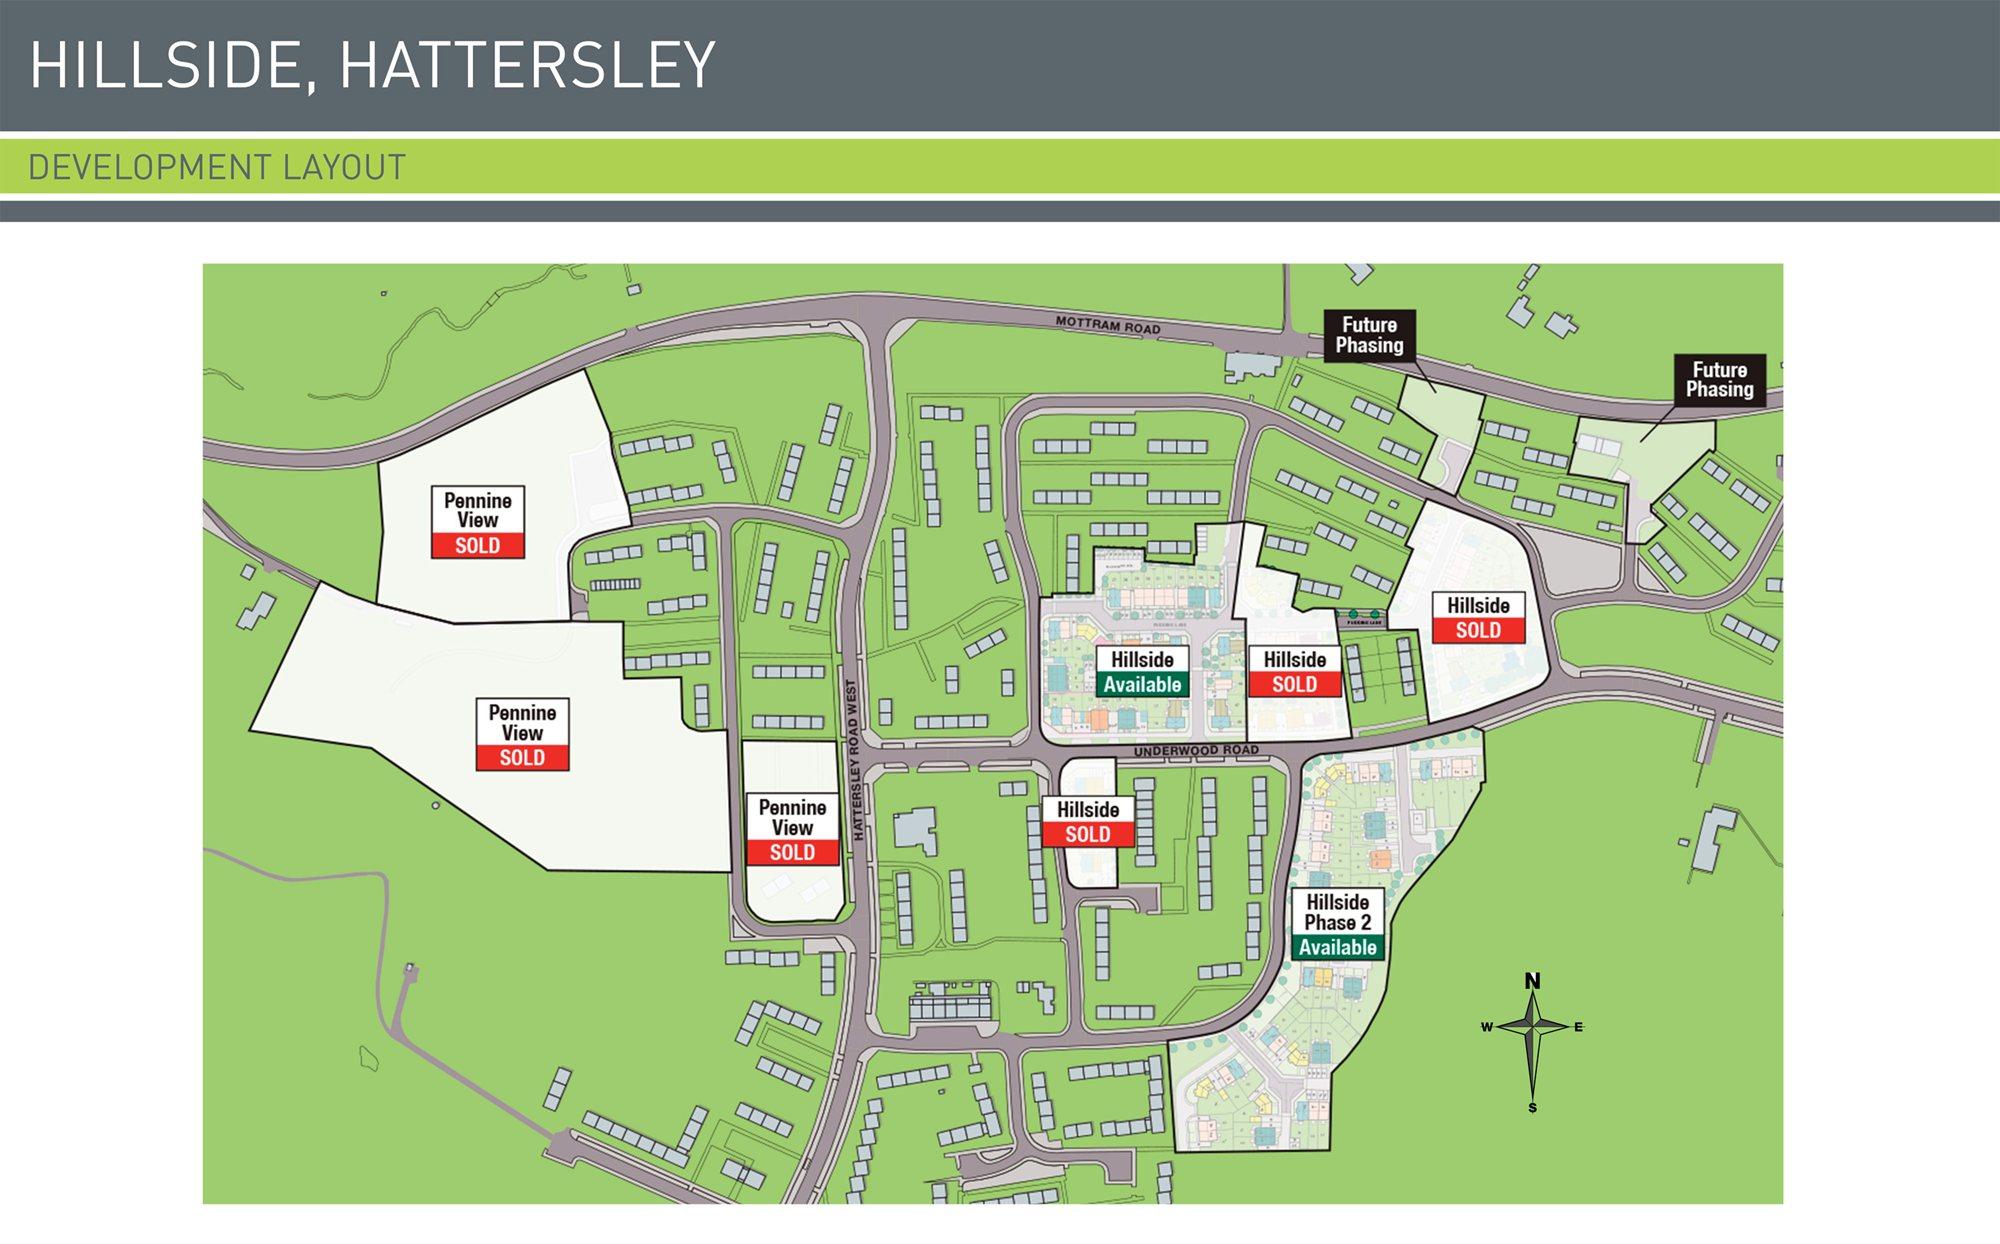 Hillside Master Site Plan